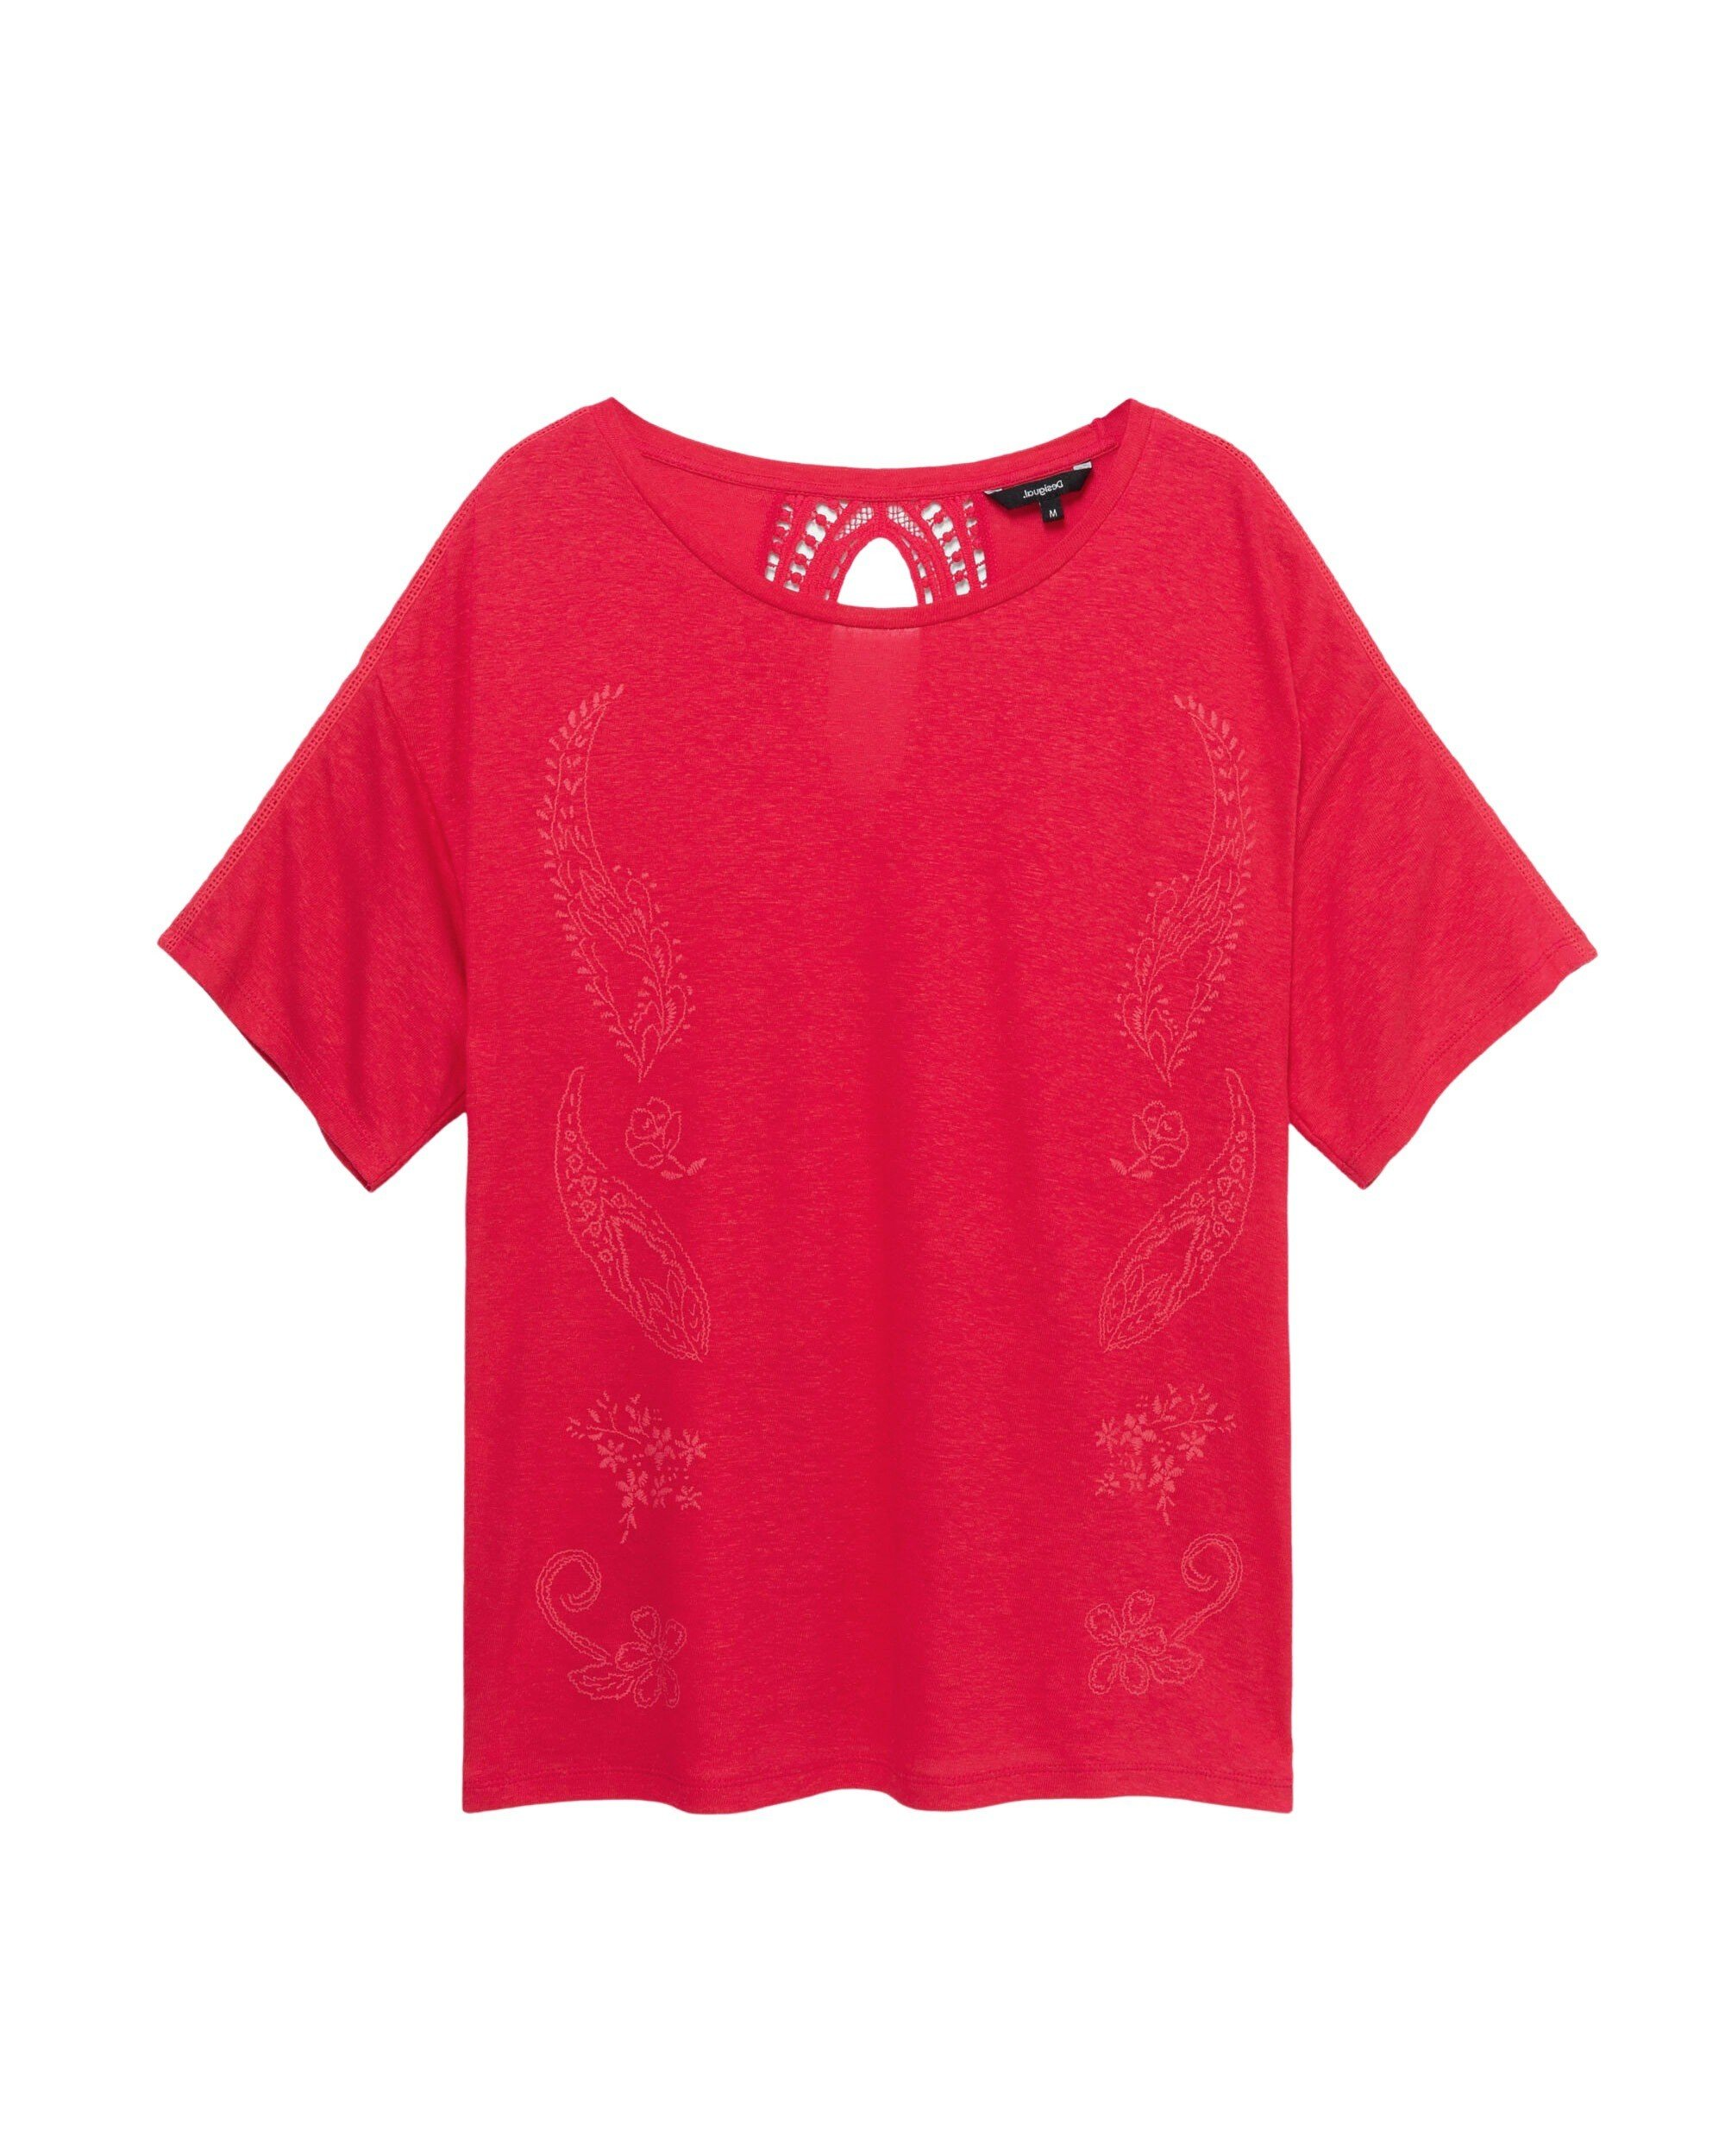 Desigual Women's T-Shirt Various Colours 263185 - fuchsia S